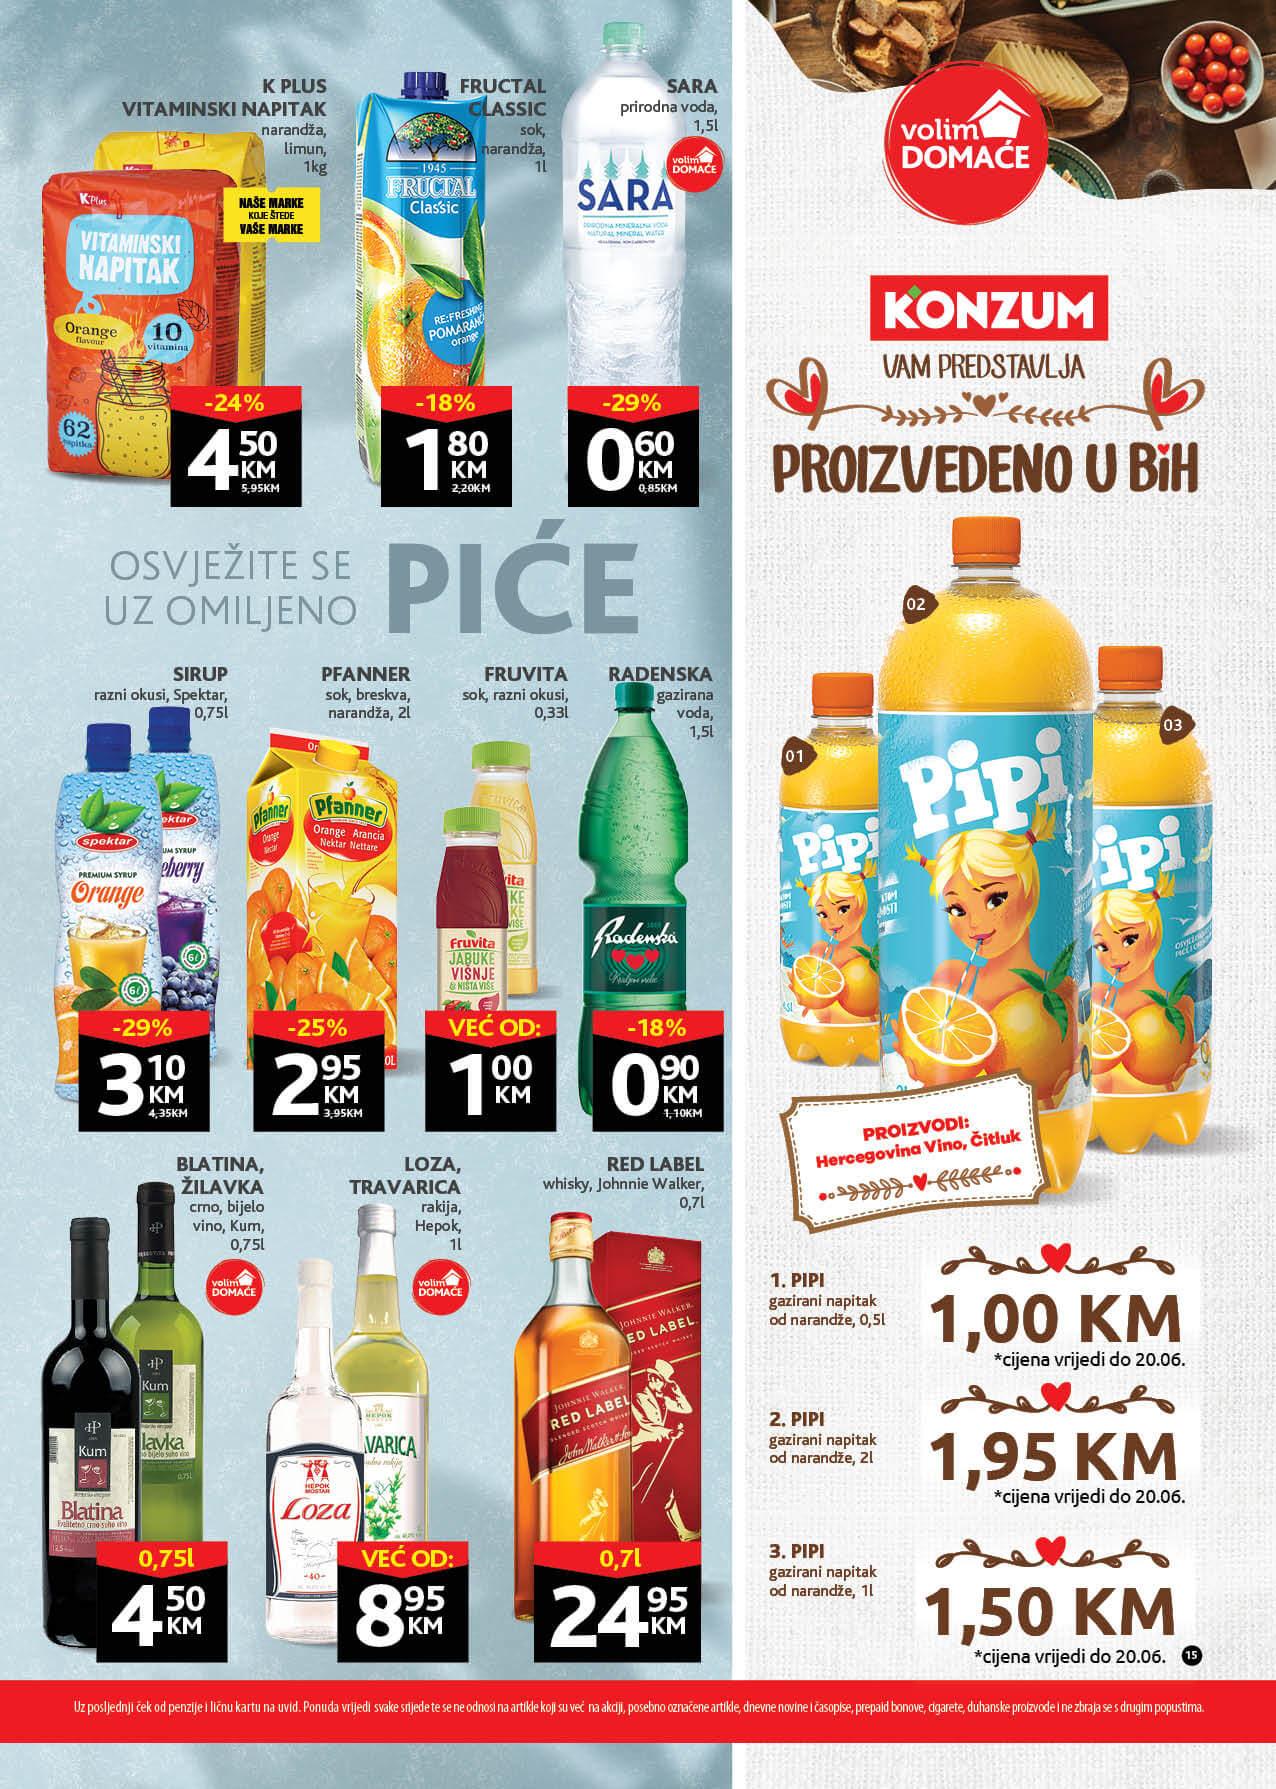 KONZUM Katalog Redovni katalog JUN 2021 07.06. 17.06. eKatalozi.com PR Page 15